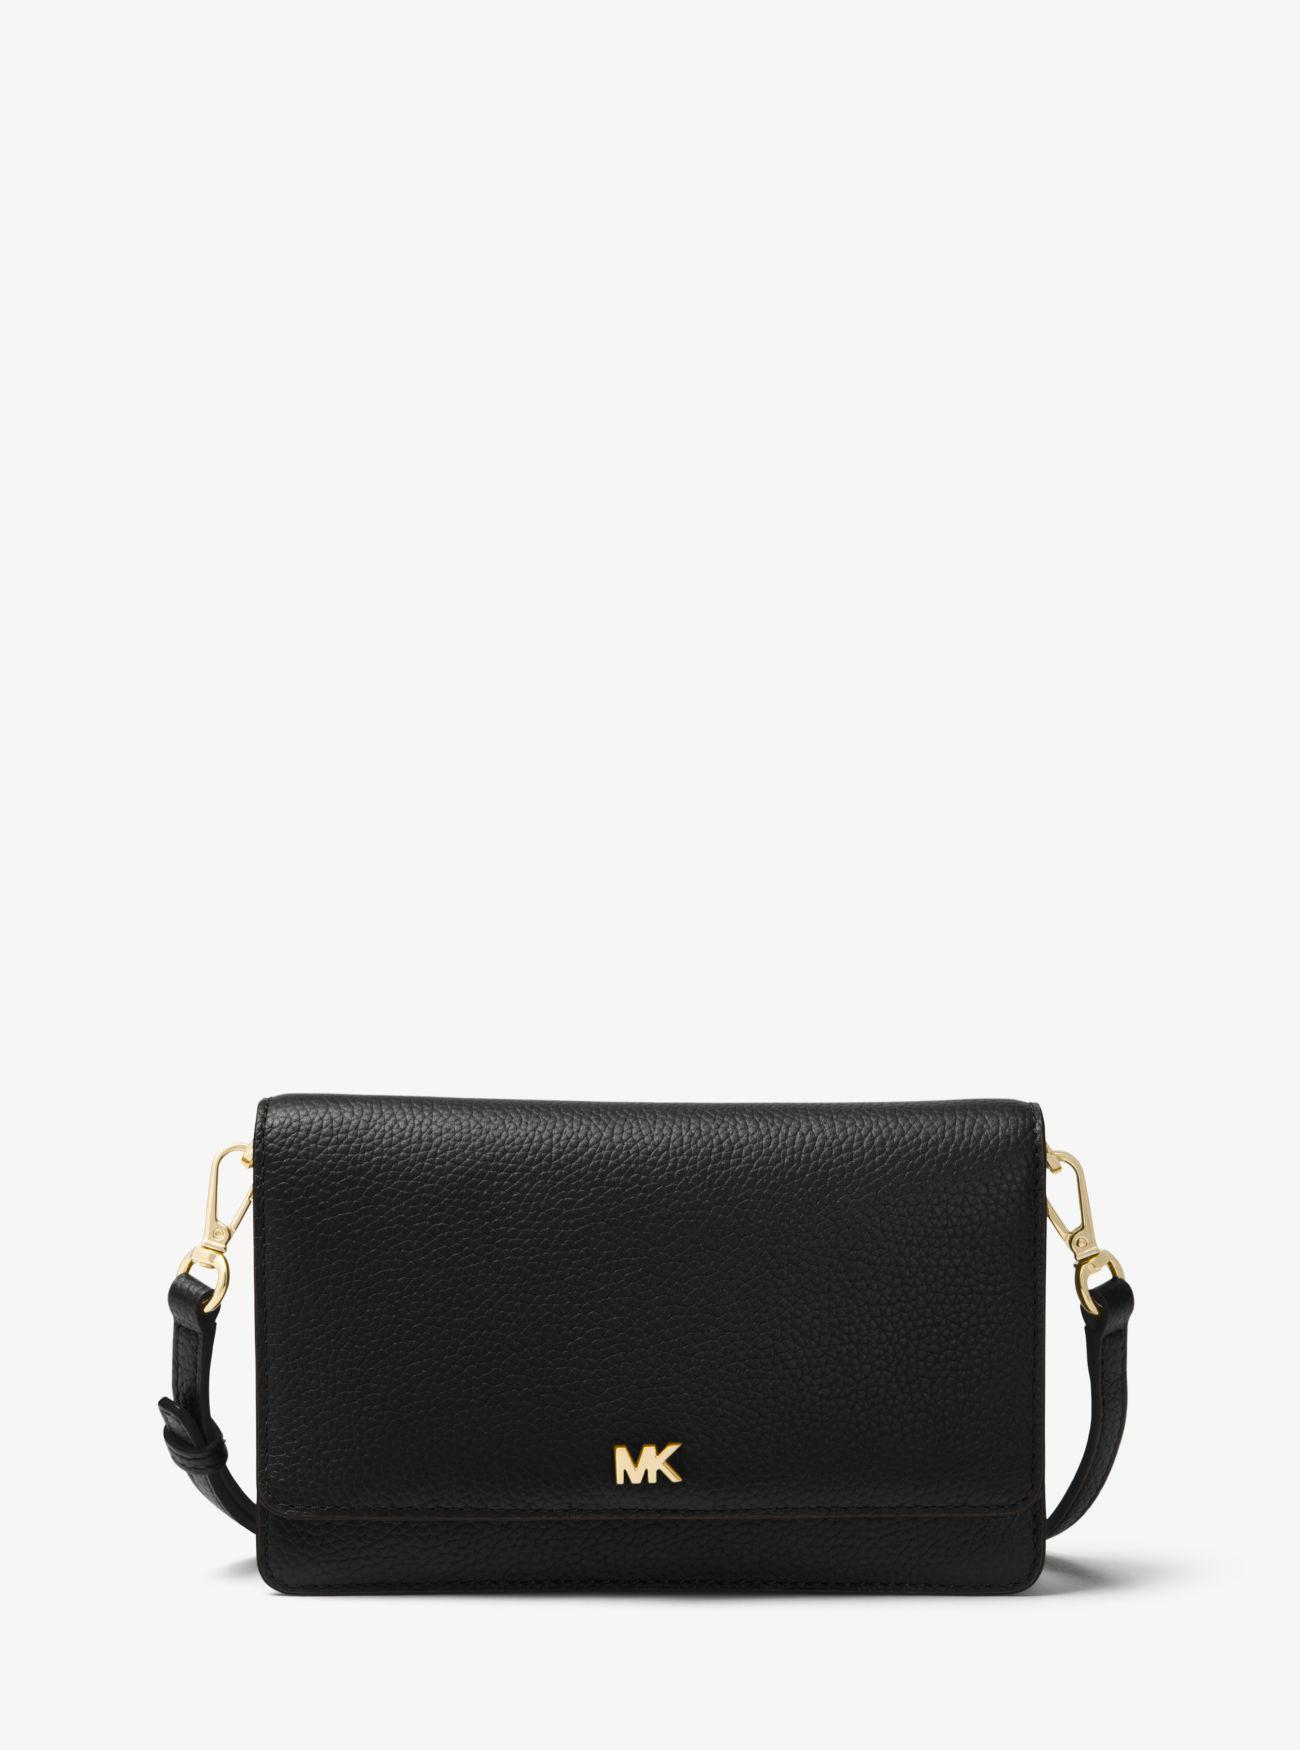 b17b6721611f Michael Kors. Women s Black Pebbled Leather Convertible Crossbody Bag